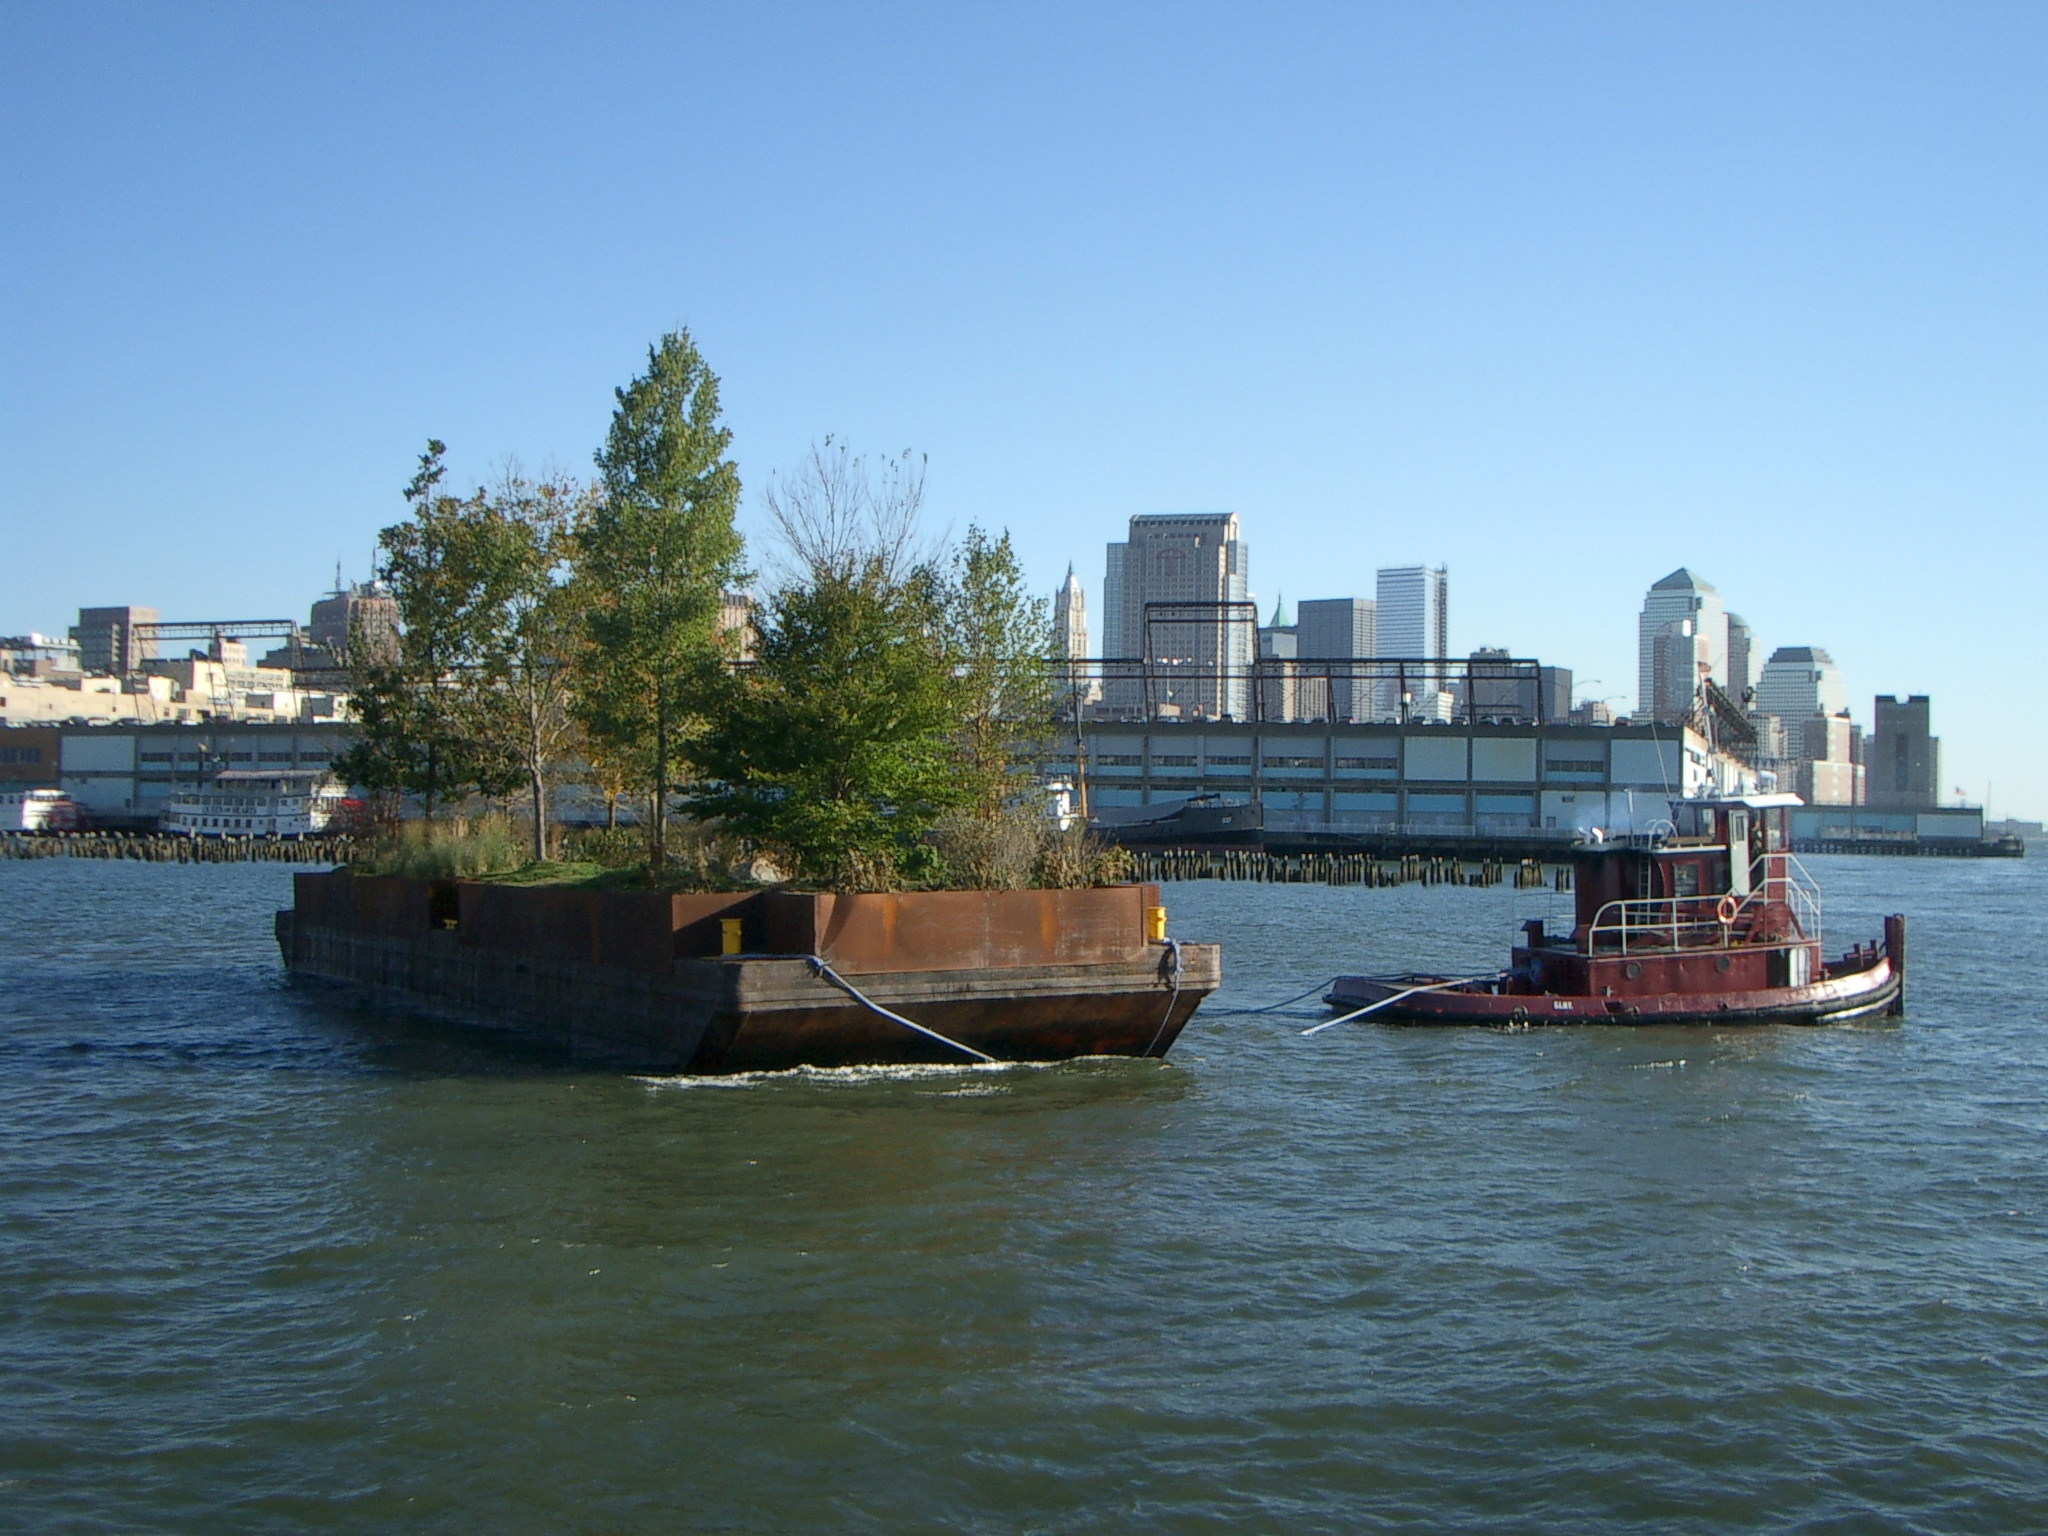 "Robert Smithson's ""Floating Island"". New York City, USA. September 2005. Photograph: Author's own."